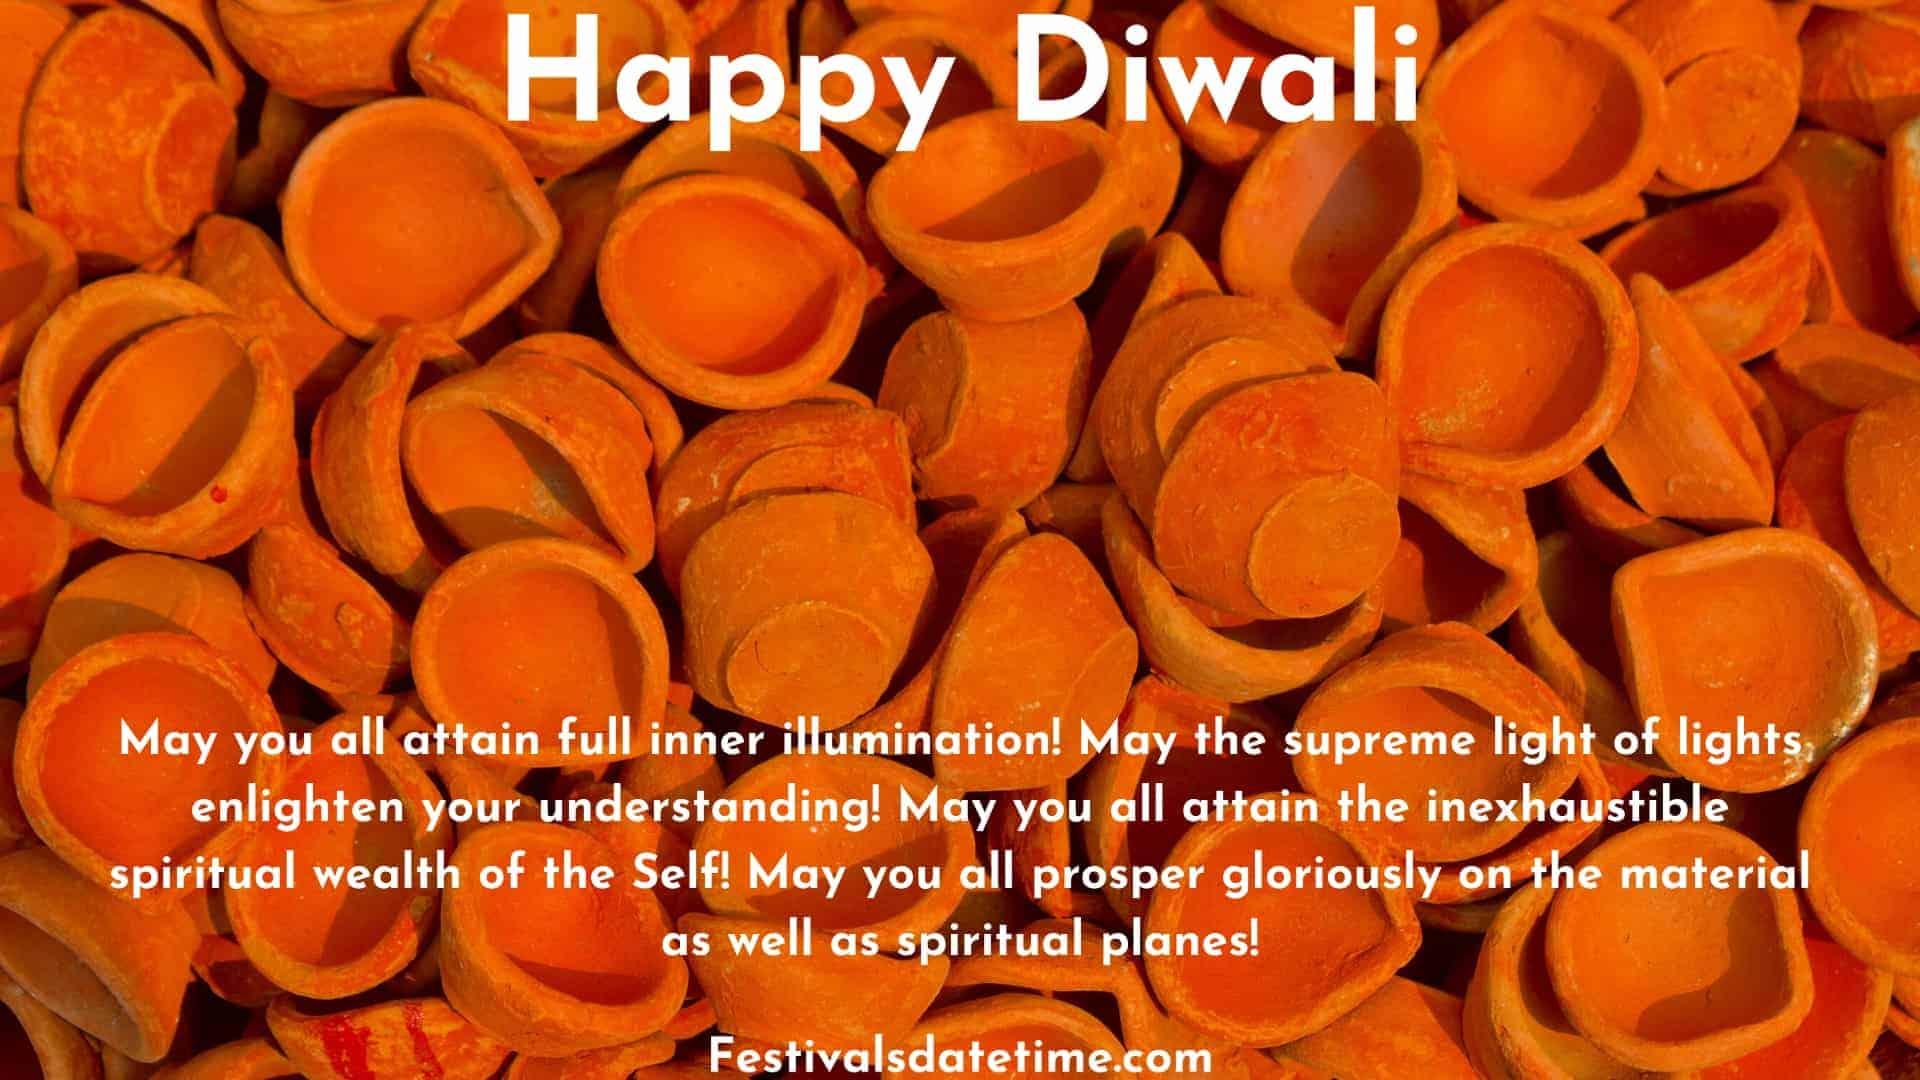 diwali_images_hd_2021_download